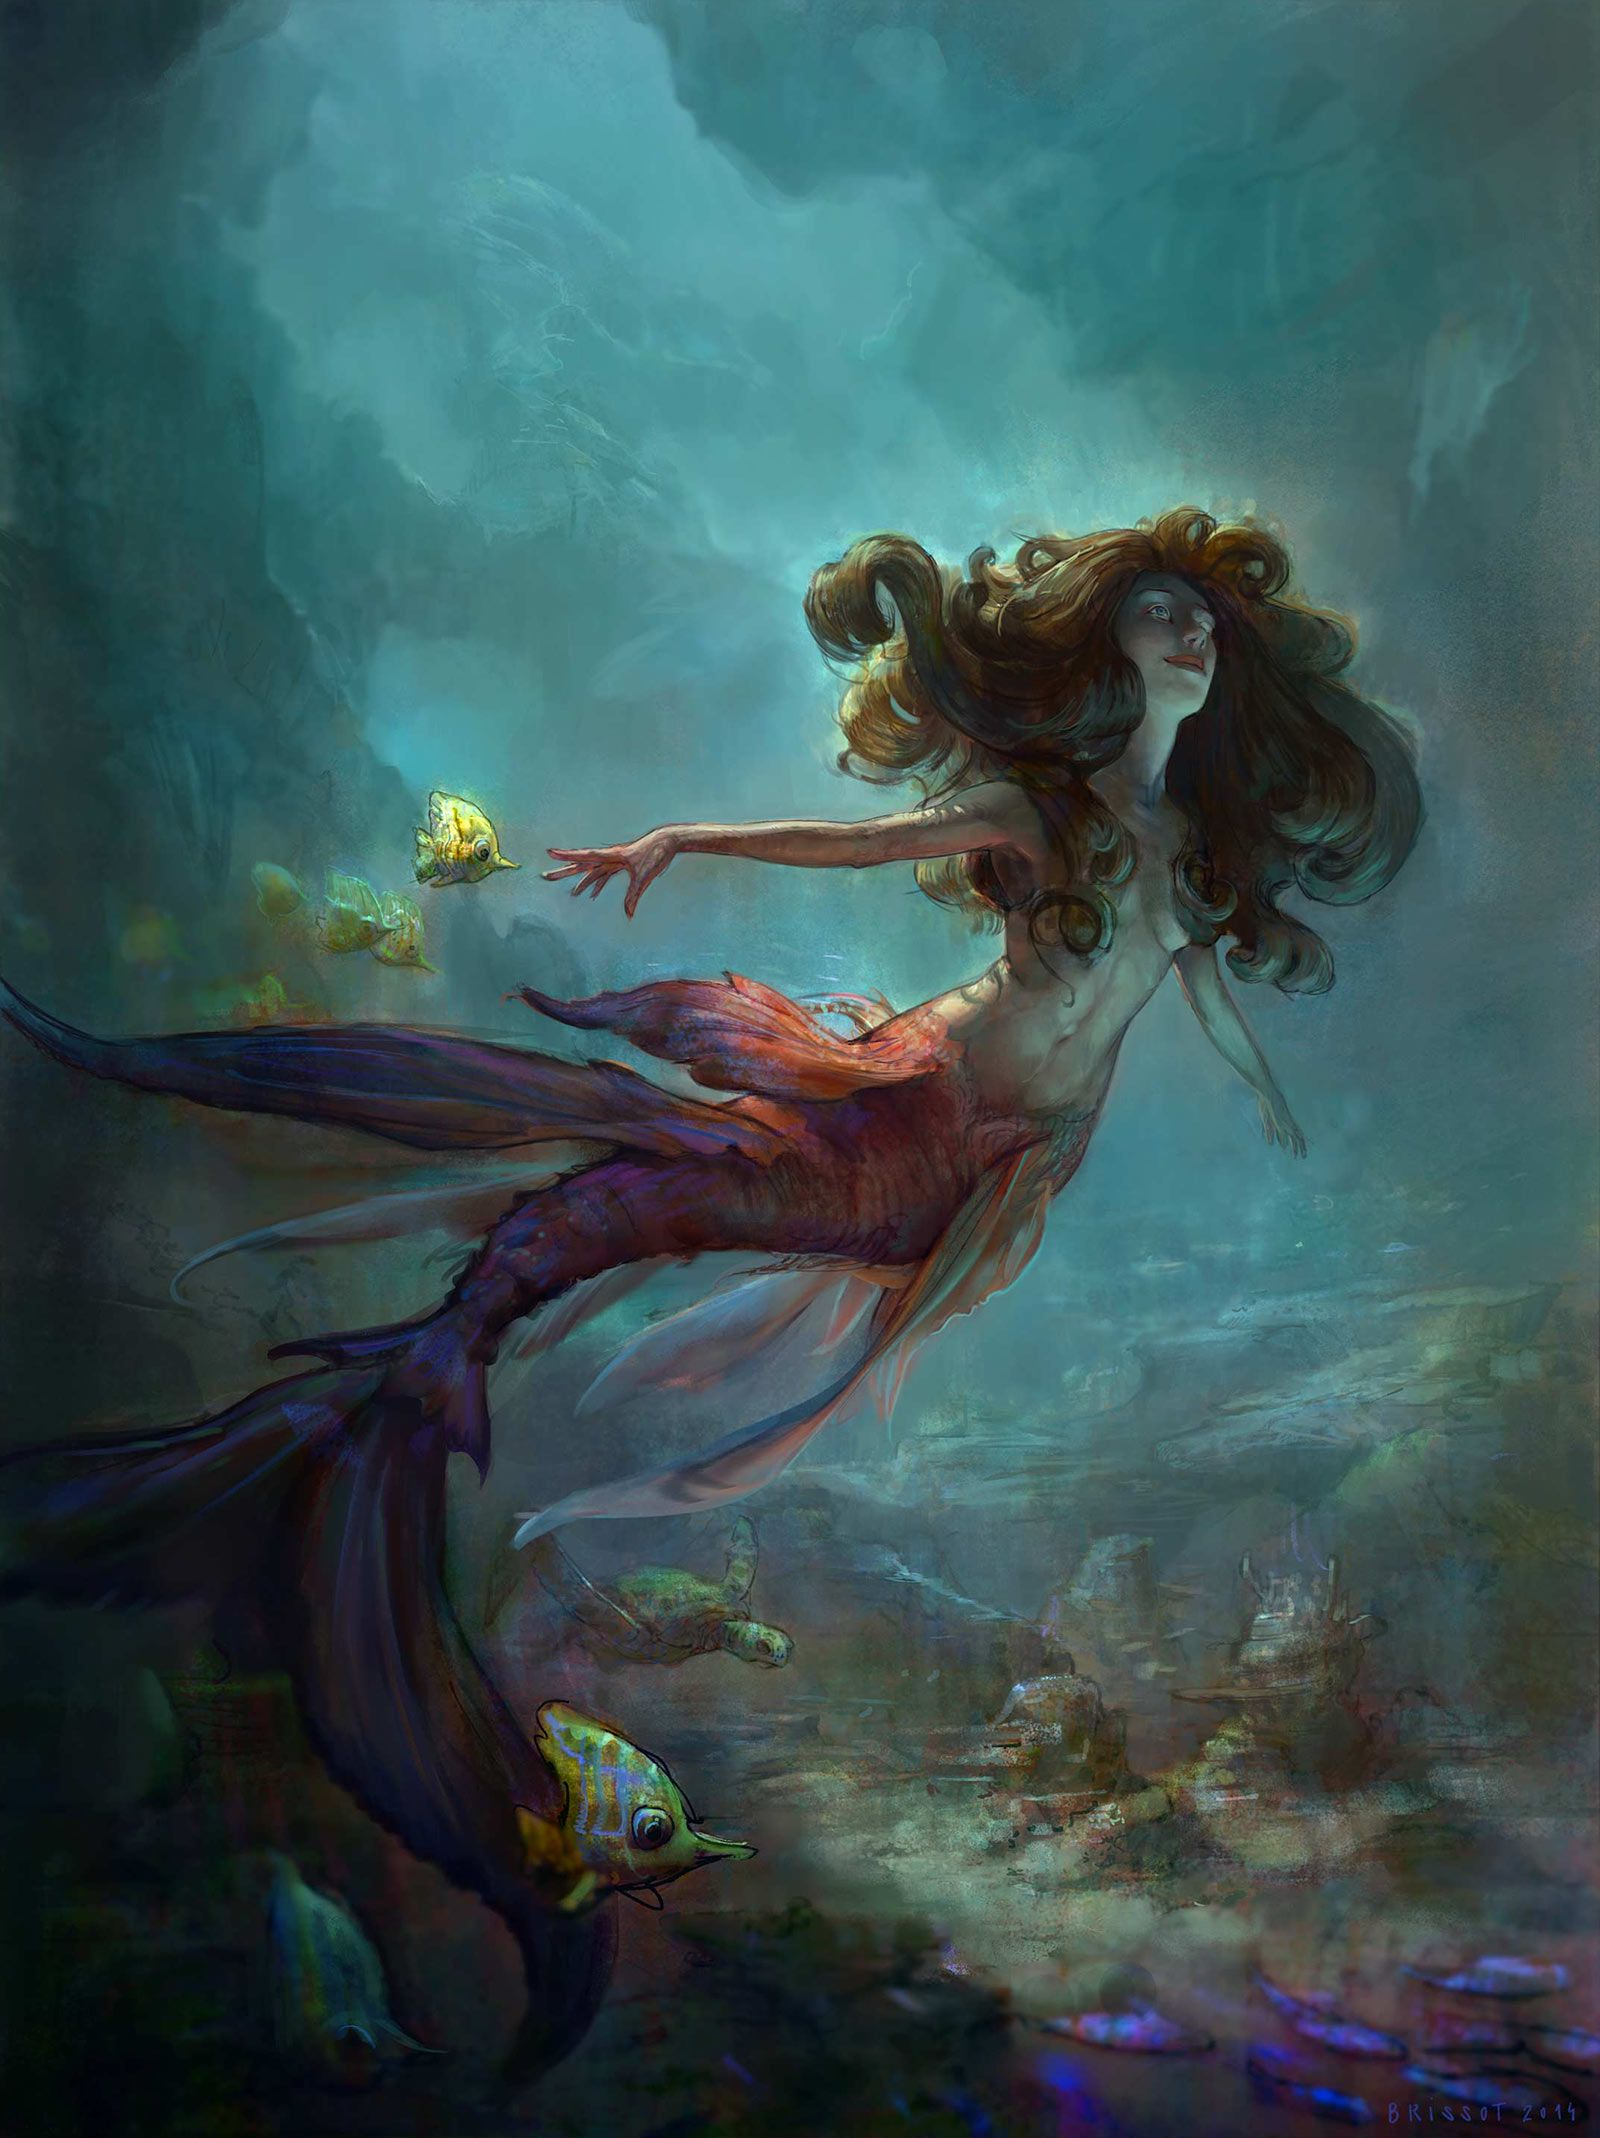 Mermaid Concept Art and Illustrations | Concept Art World